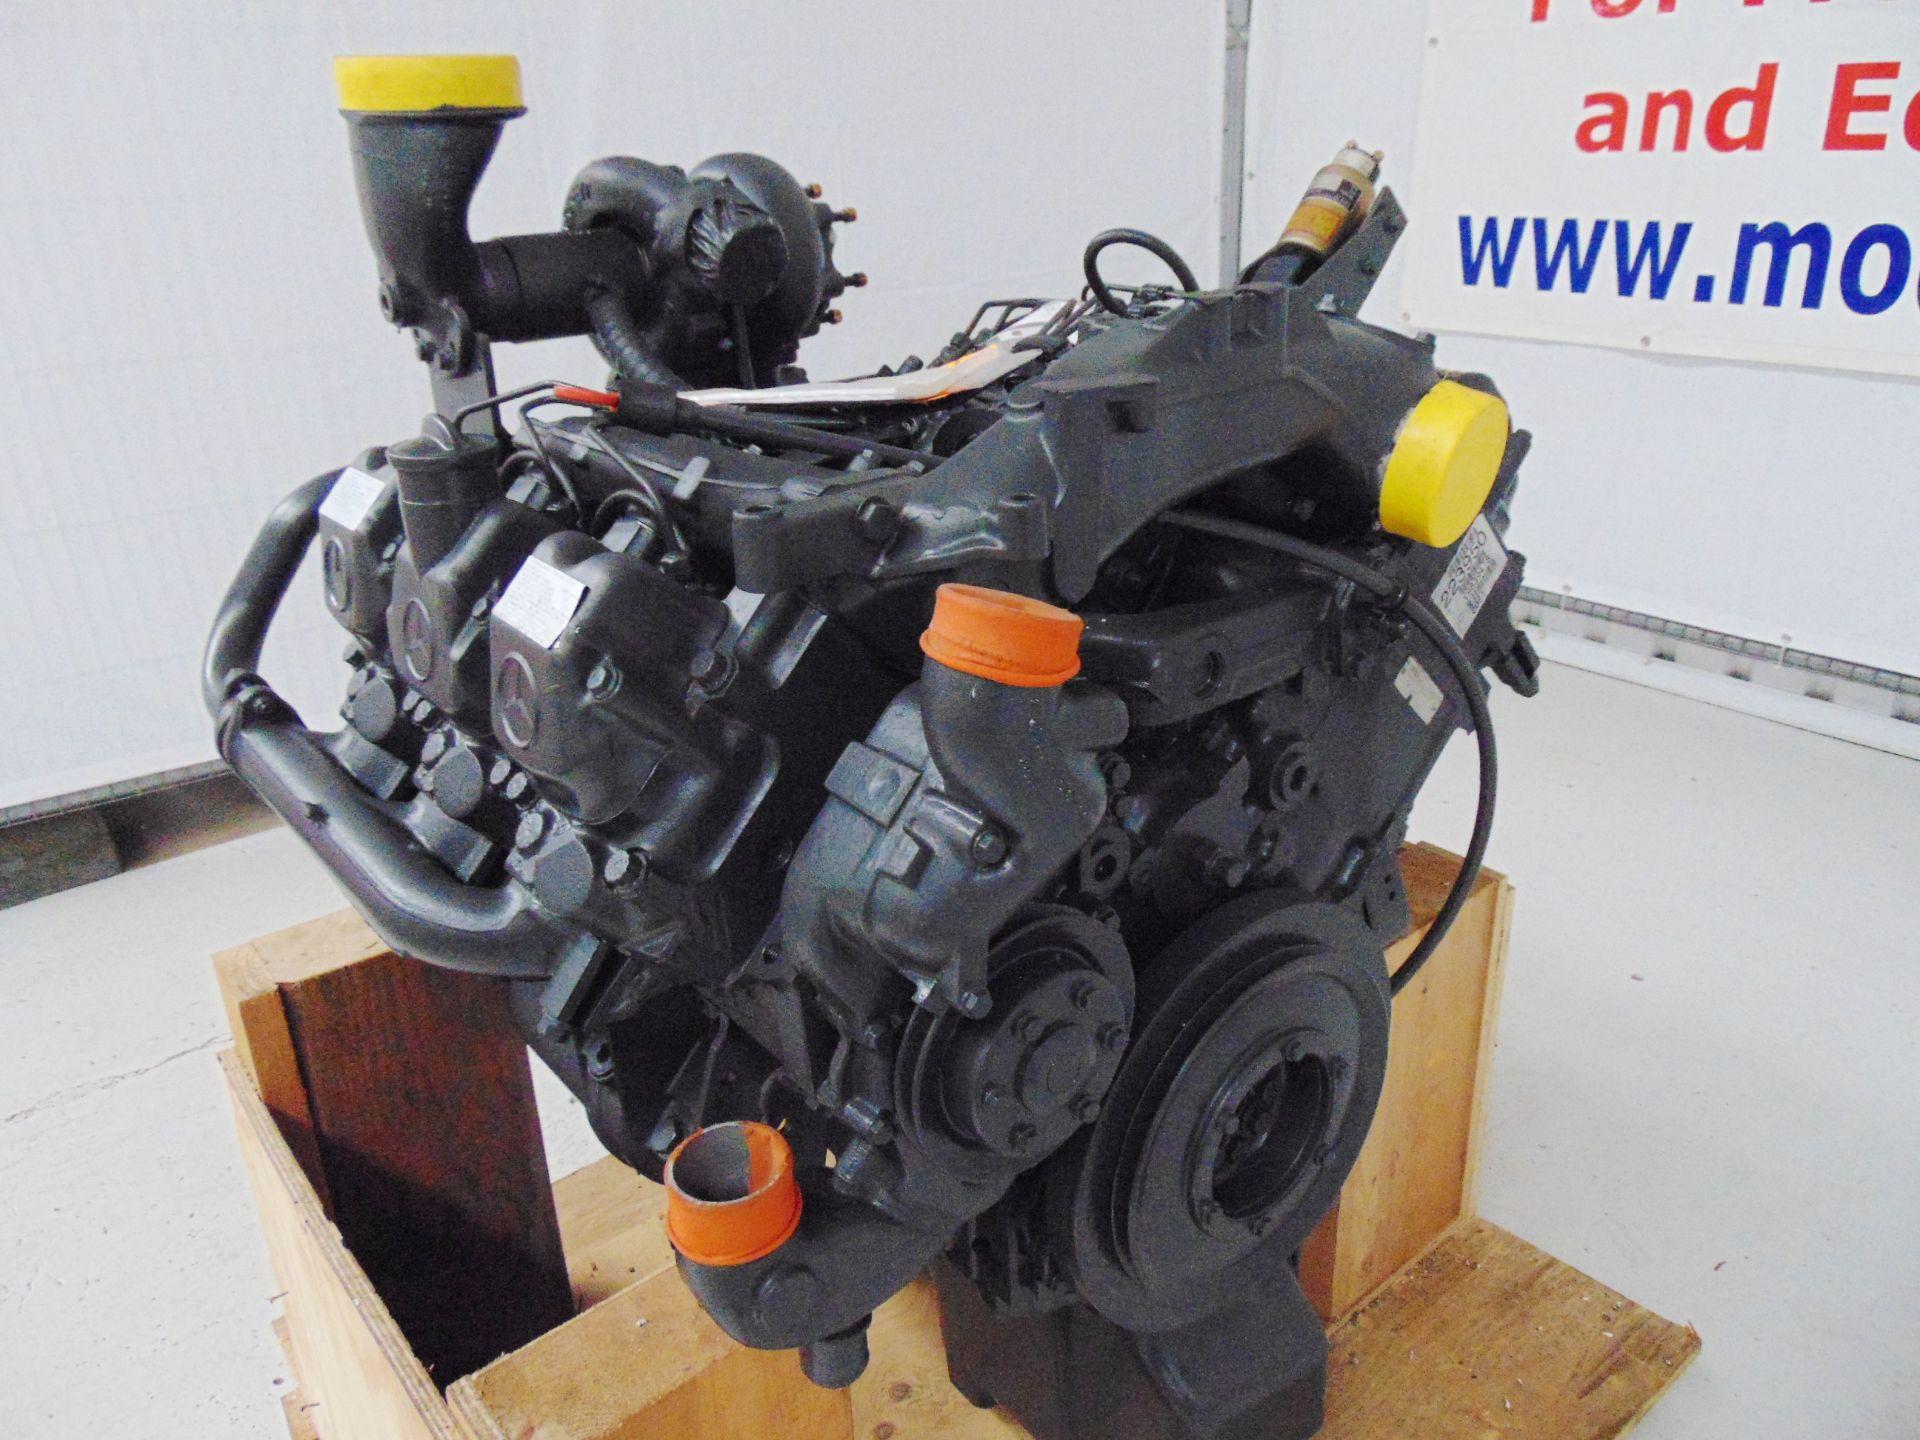 Lot 4 - Brand New & Unused Mercedes-Benz OM441LA V6 Turbo Diesel Engine